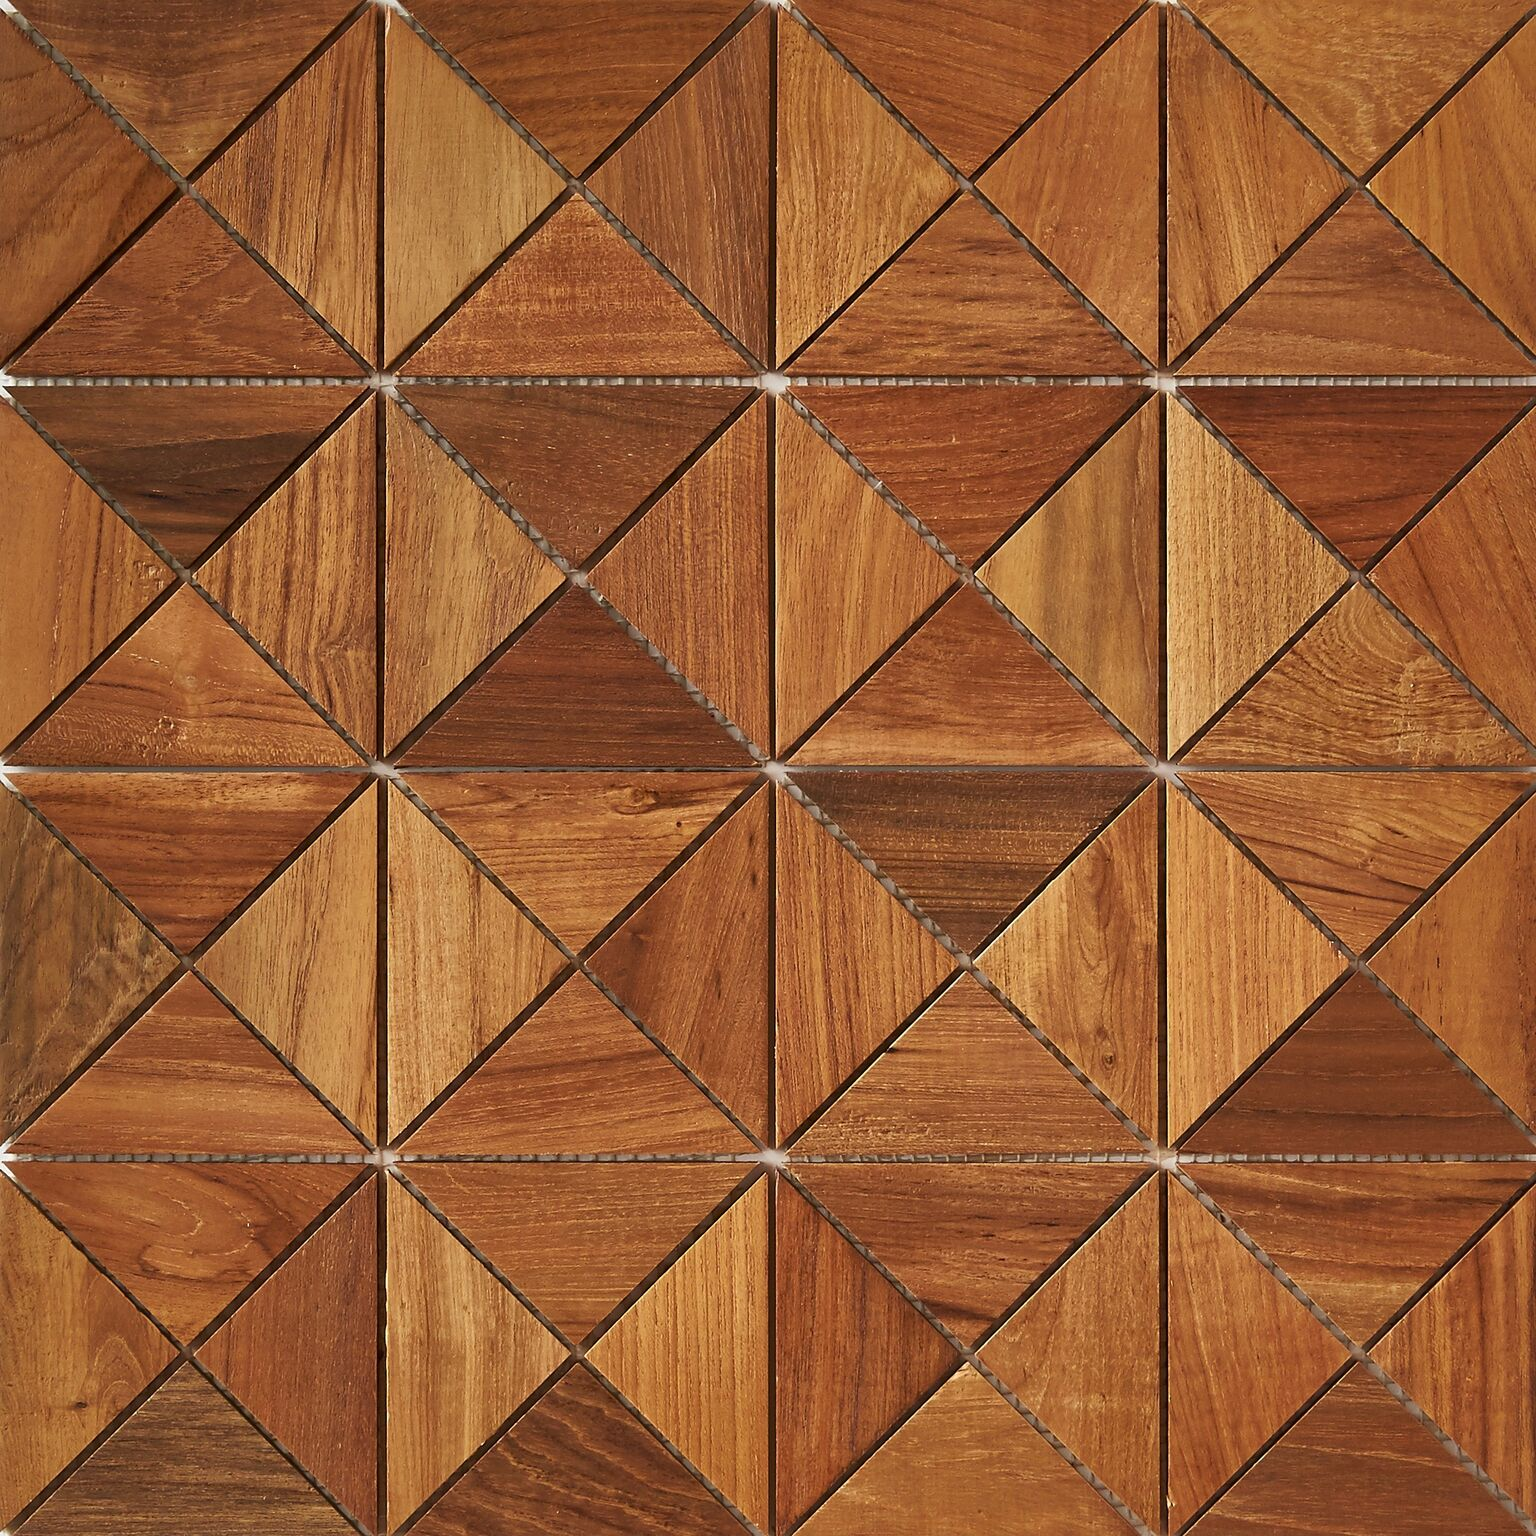 natural matte finish 8 - Teak Tile - Crosscut